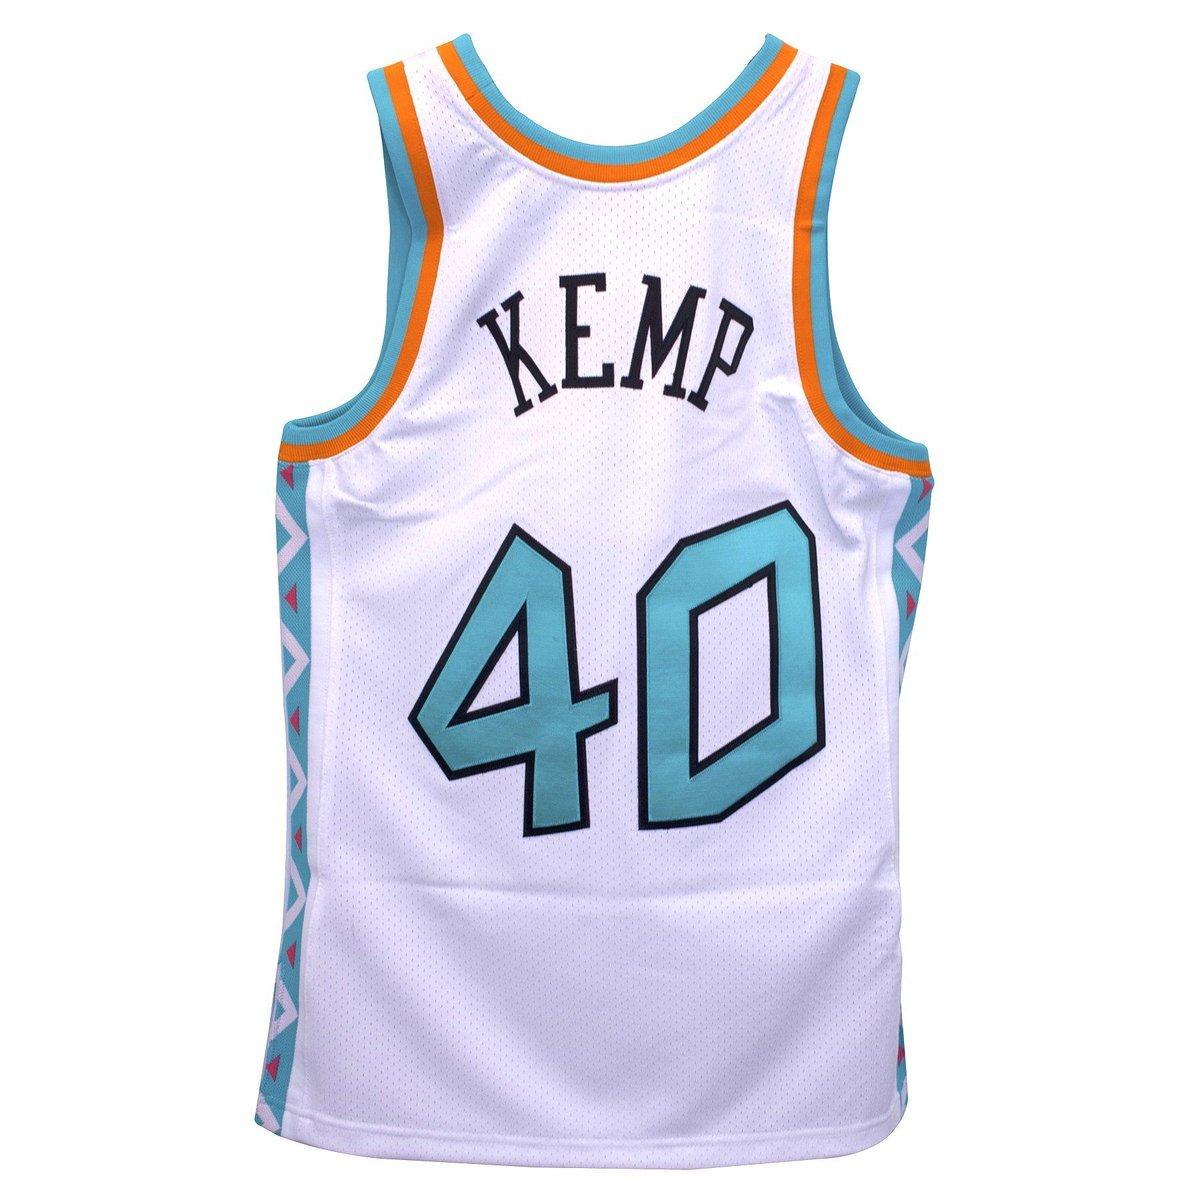 83468a317c5 ...  1996allstar  mitchellandness  warmup  trackjacket  snapbackhat  jersey   basketballjersey  shawnkemp  40  jerseypic.twitter.com 3hxNjxMUII